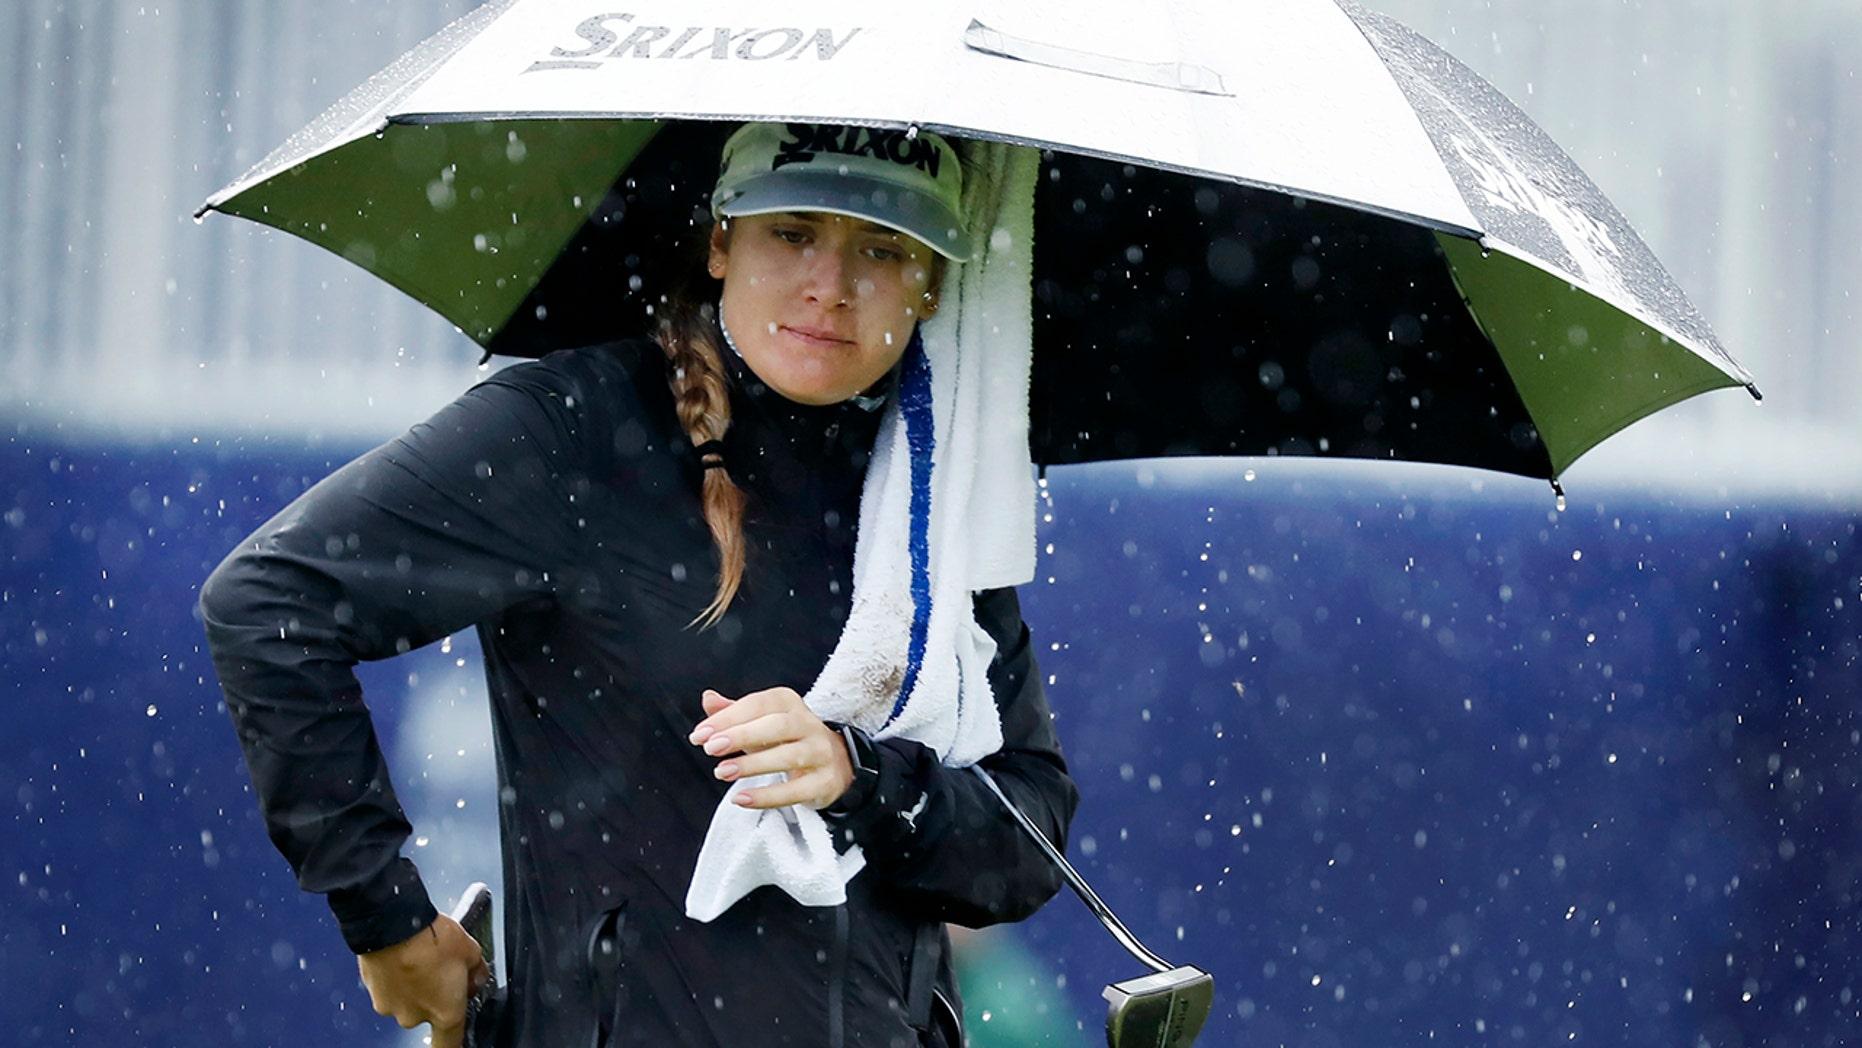 Hannah Green, of Australia, walks on the 18th green during the first round of the KPMG Women's PGA Championship golf tournament Thursday, June 20, 2019, in Chaska, Minn. (AP Photo/Charlie Neibergall)